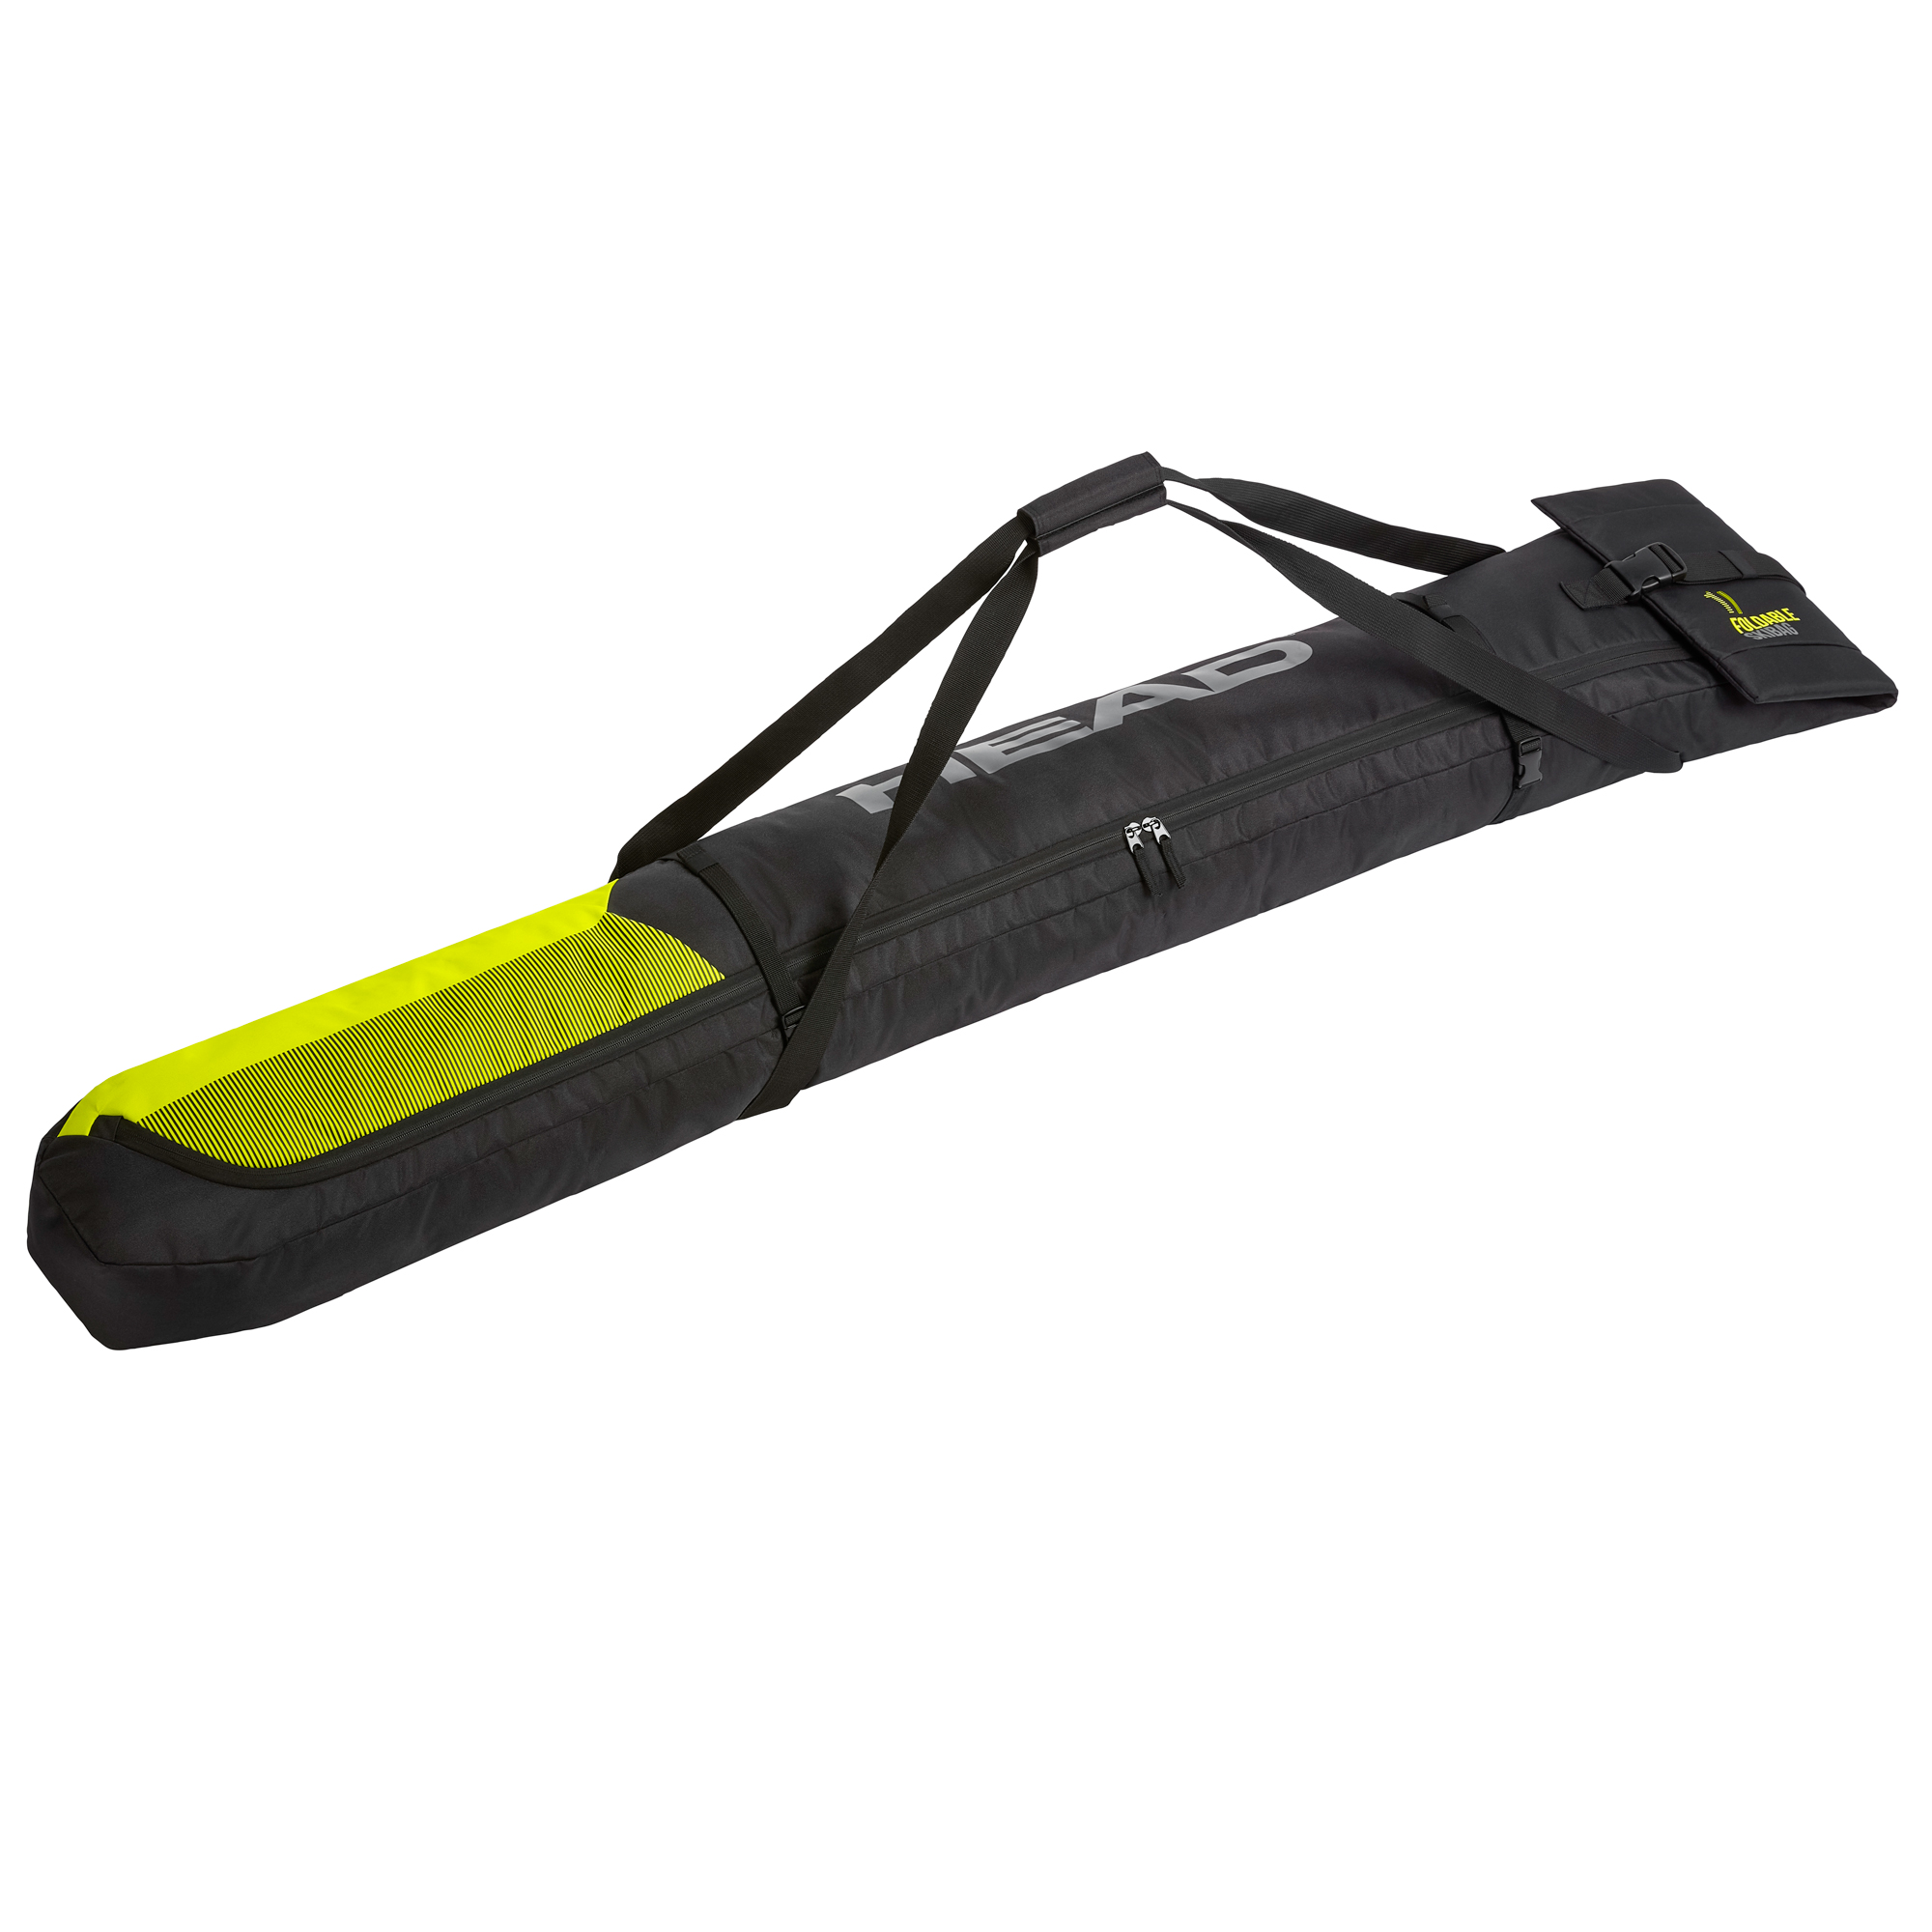 Sac à ski HEAD Allride Simple 2021 Noir et Jaune